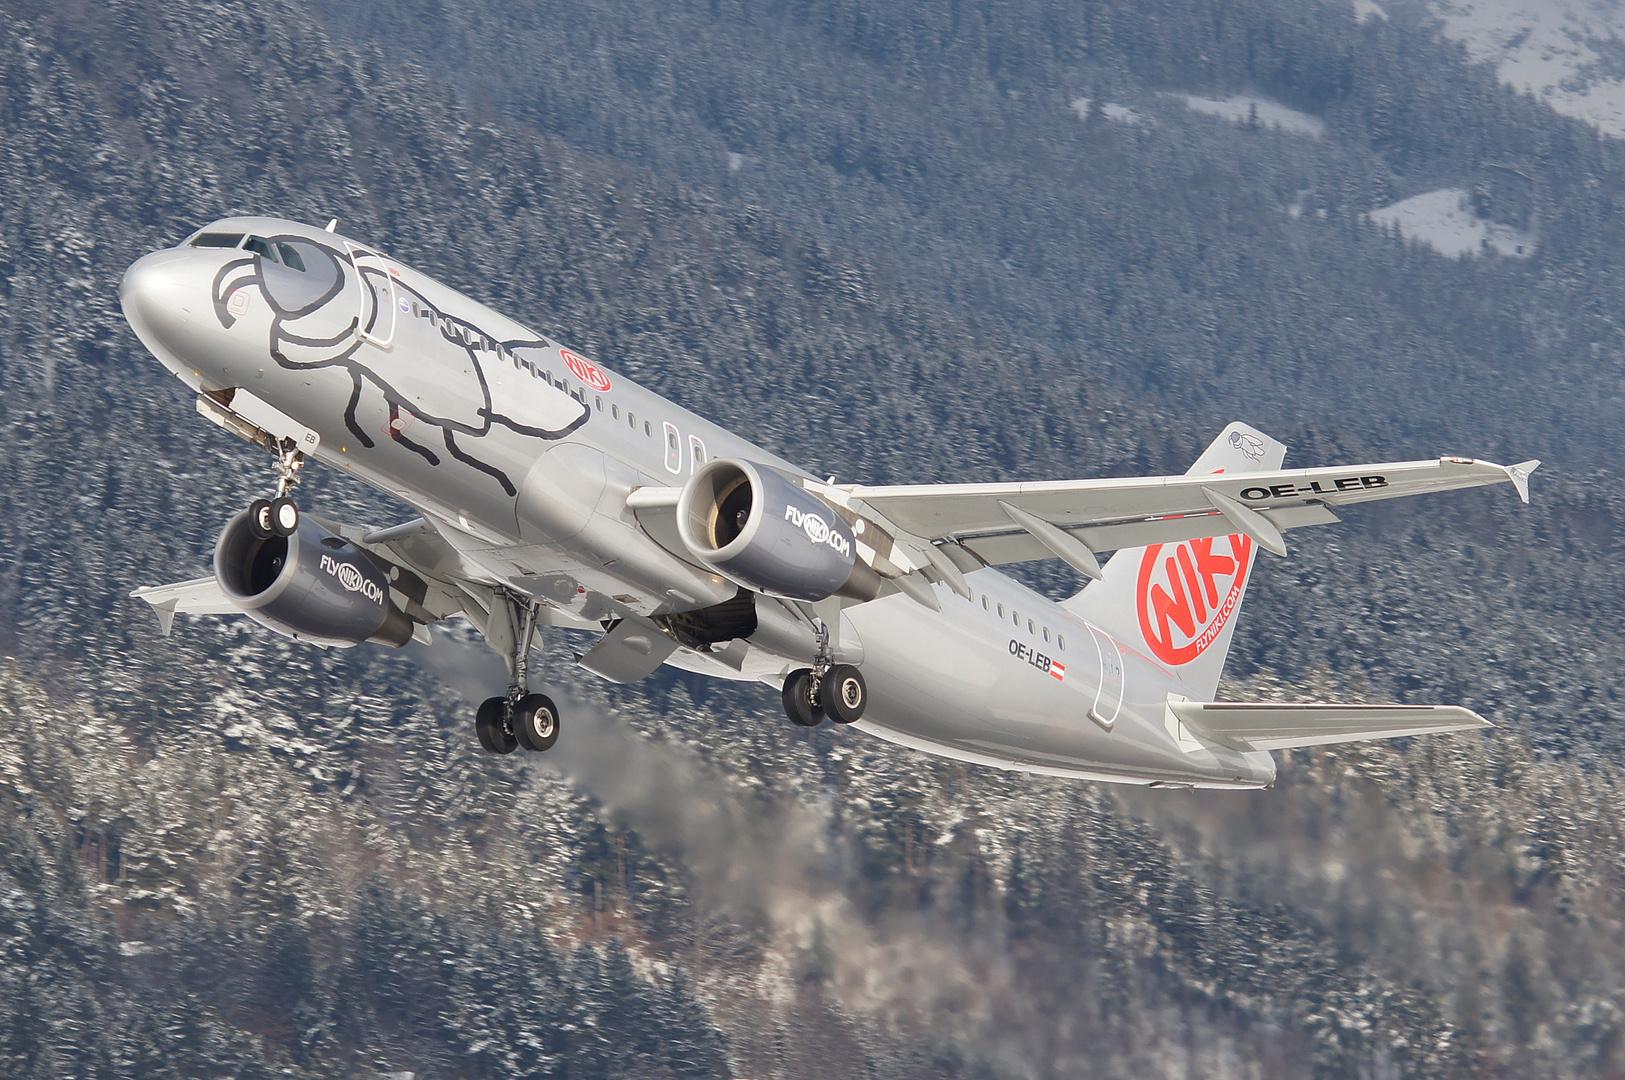 Abflug der Niki Maschine aus Innsbruck